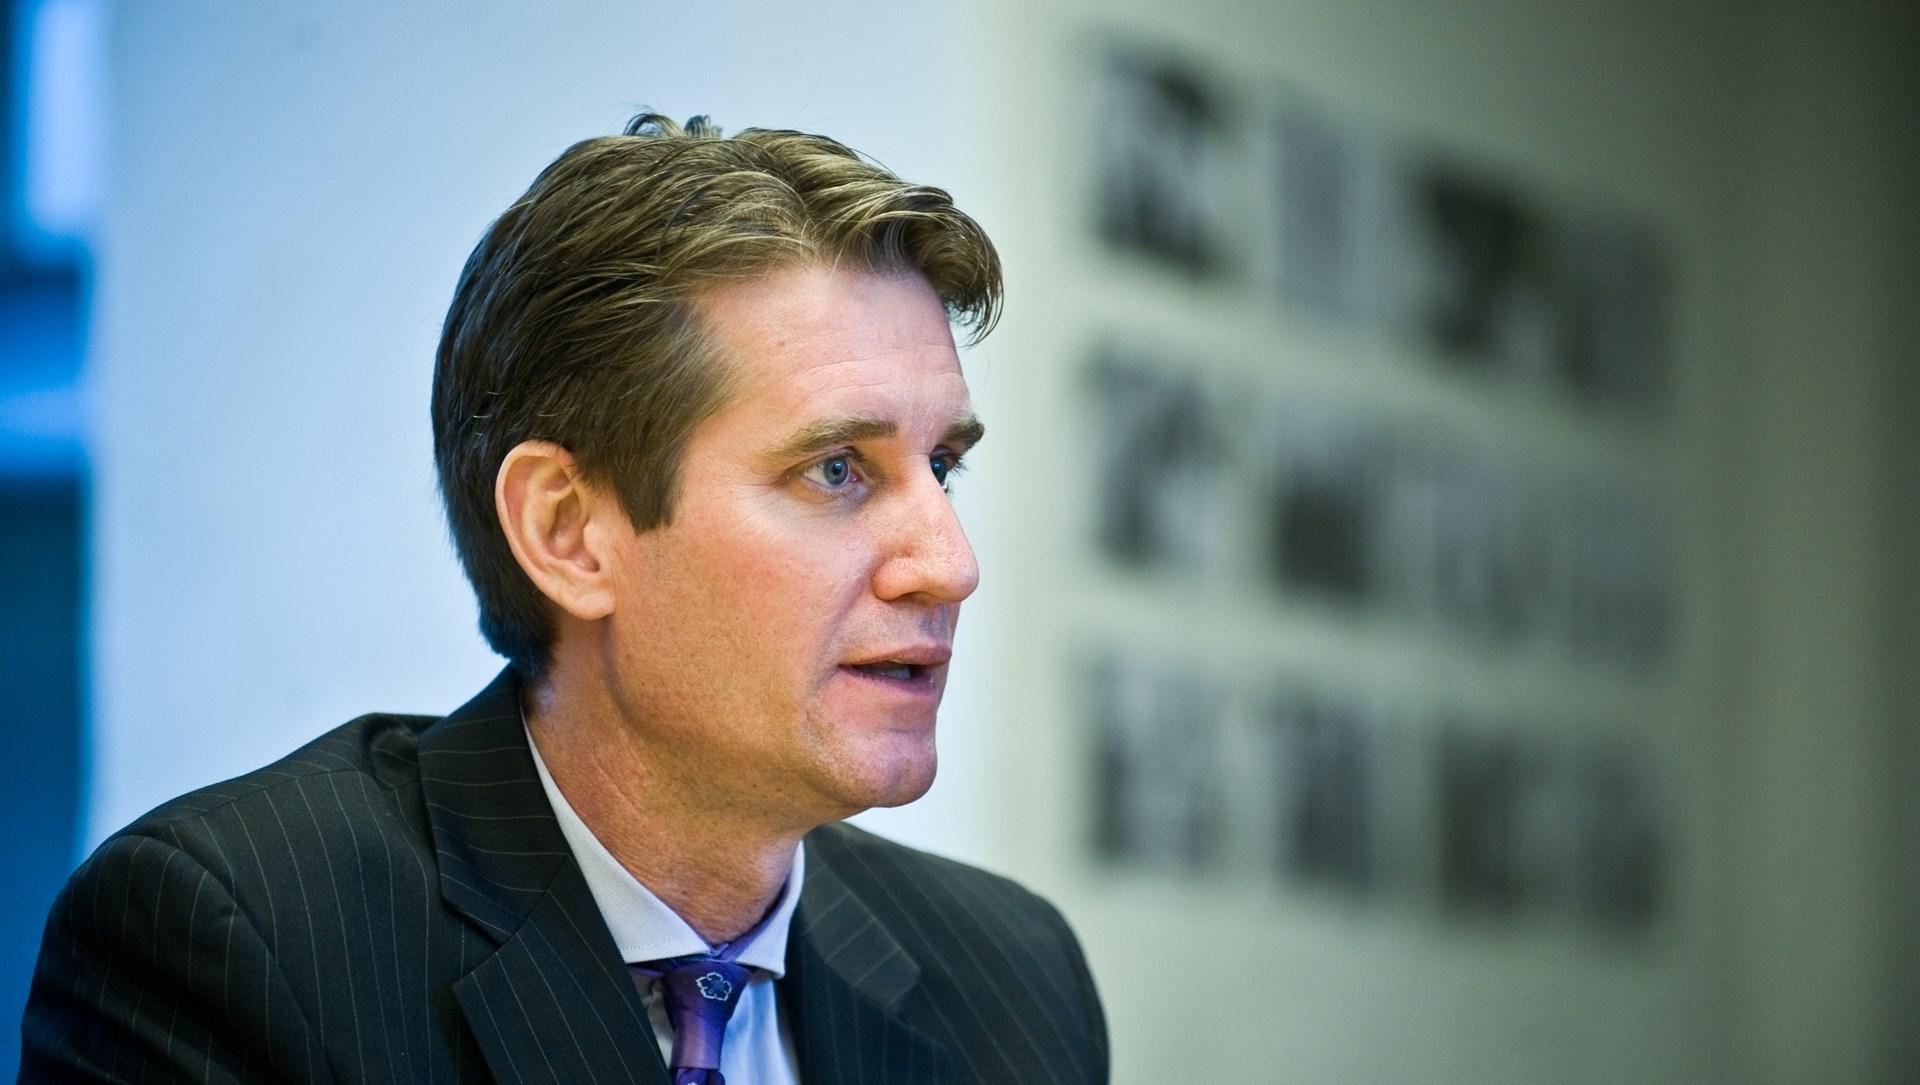 Matthew Bryza #новости выборы-2021, Грузия-США, Мэтью Брайза